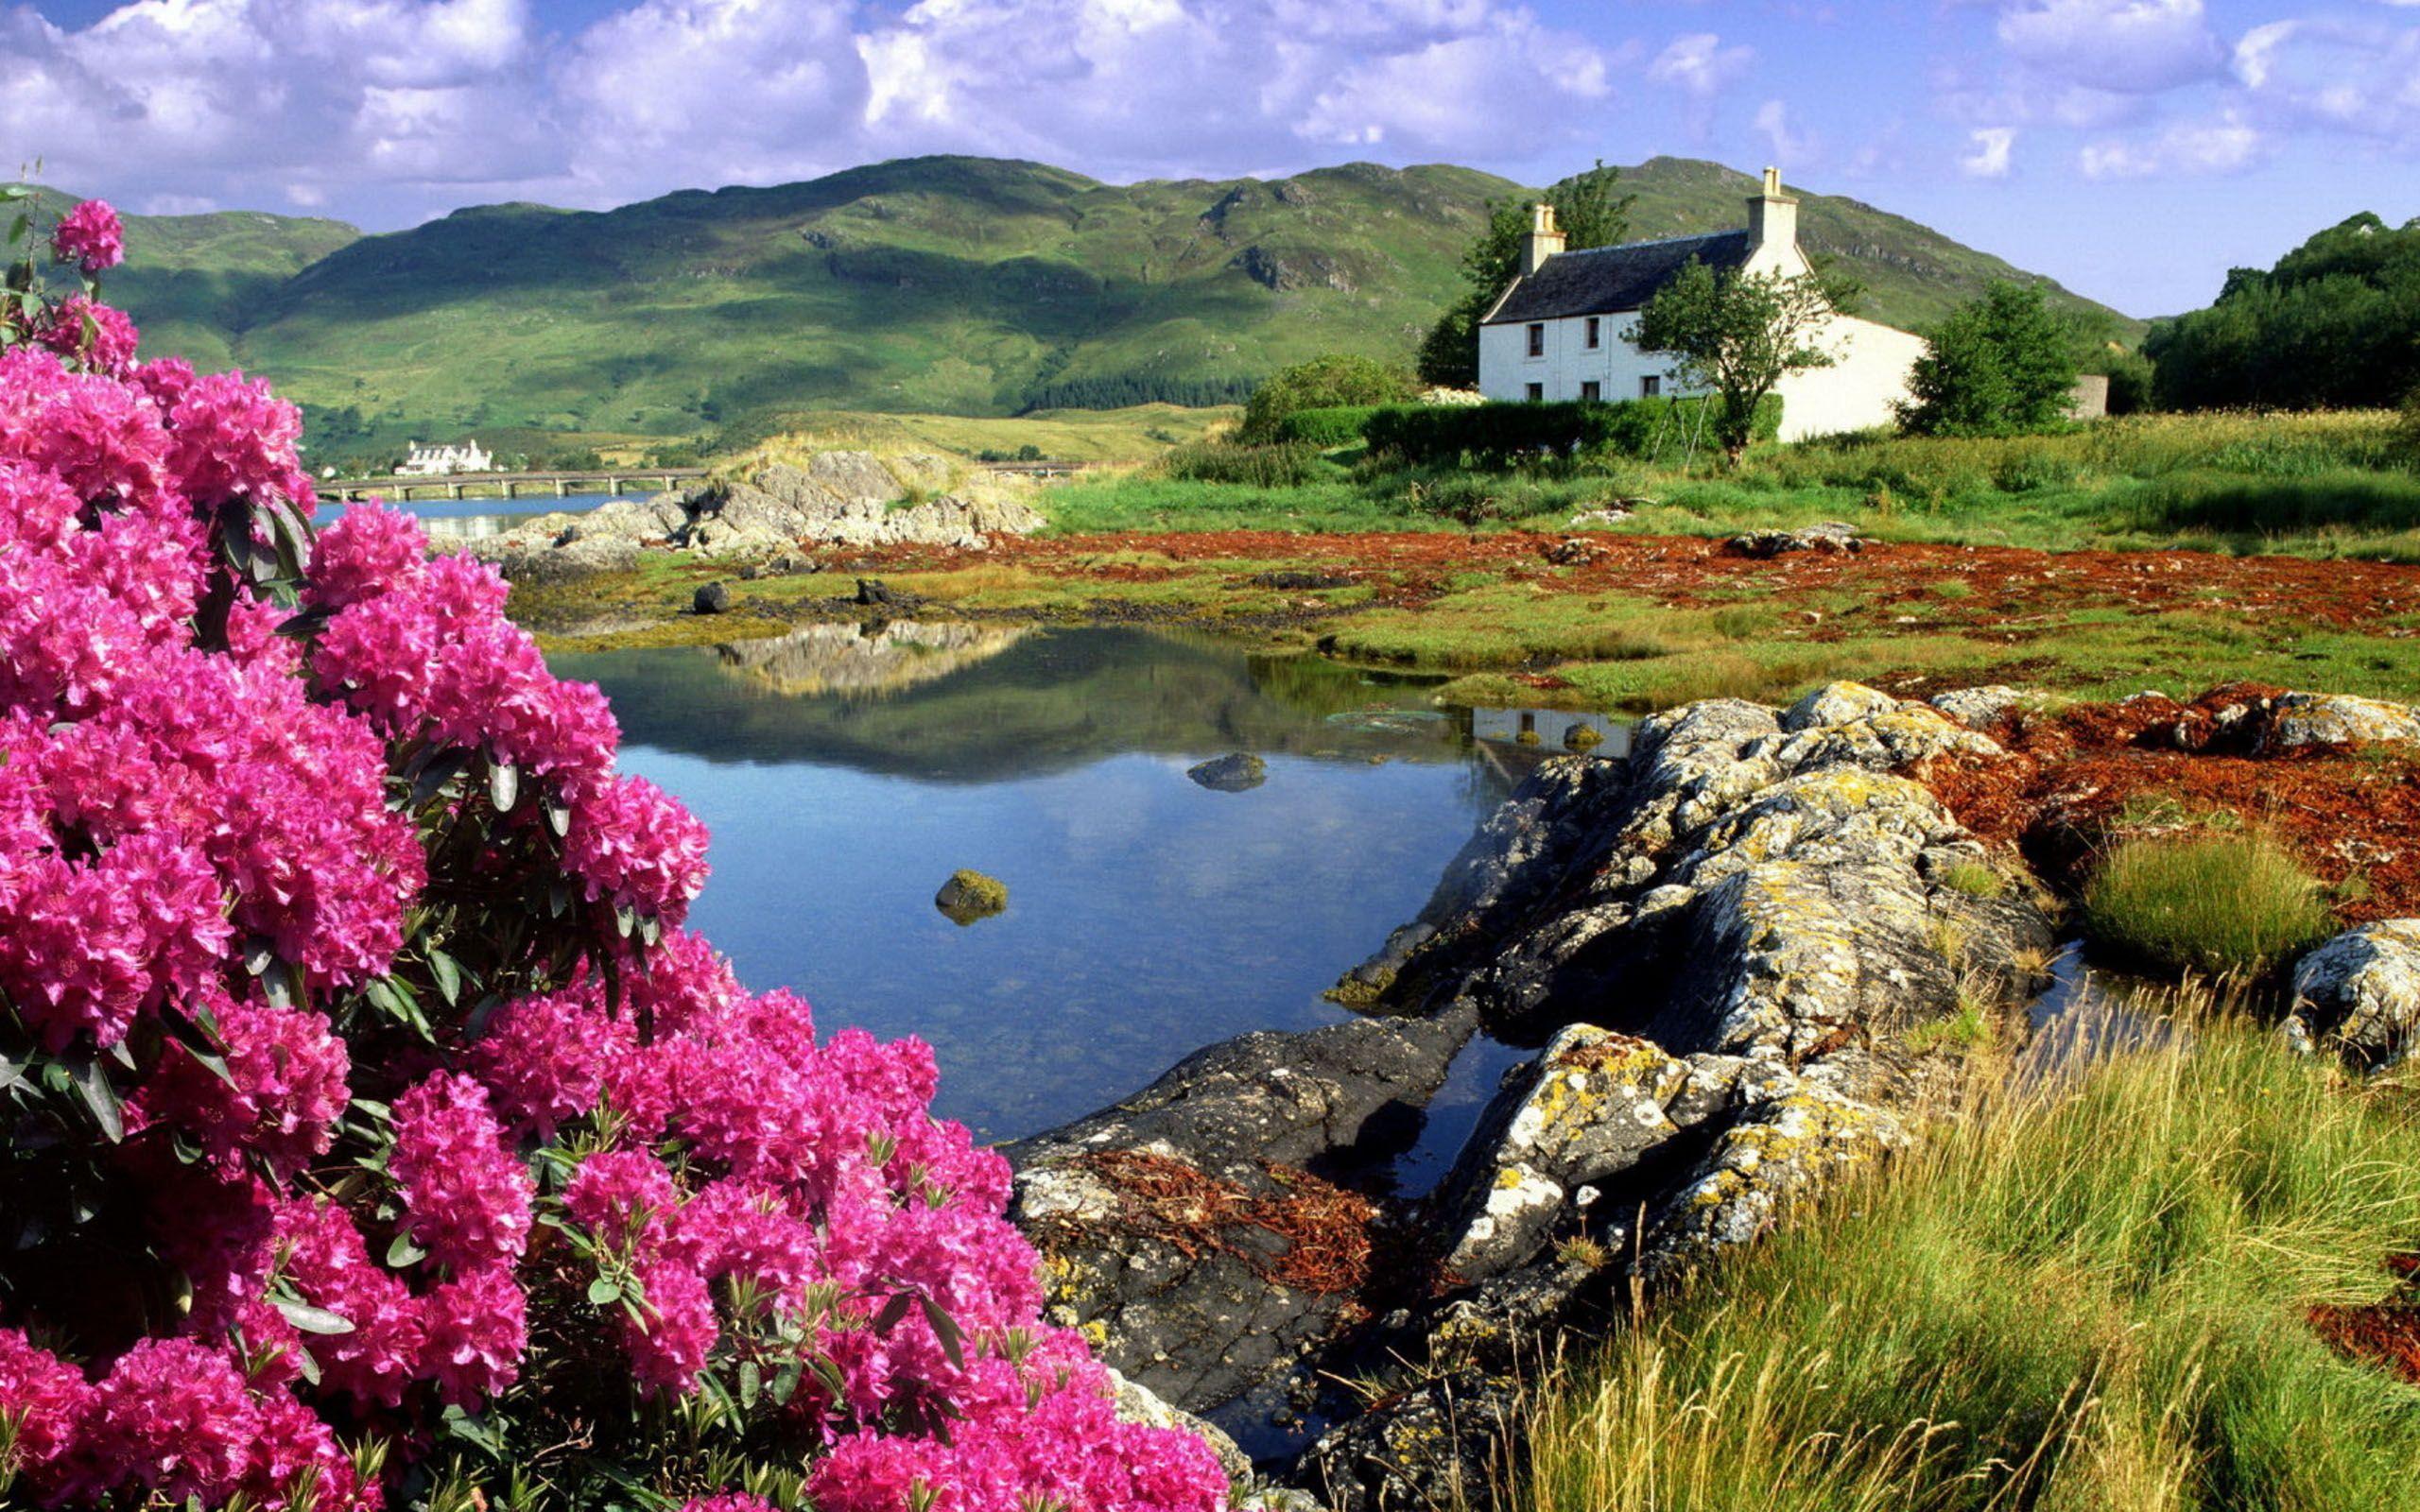 Scottish Highlands Dornie Ross Shire Highlands Scotland Desktop Wallpapers Wall Beautiful Landscapes Scenery Nature Wallpaper